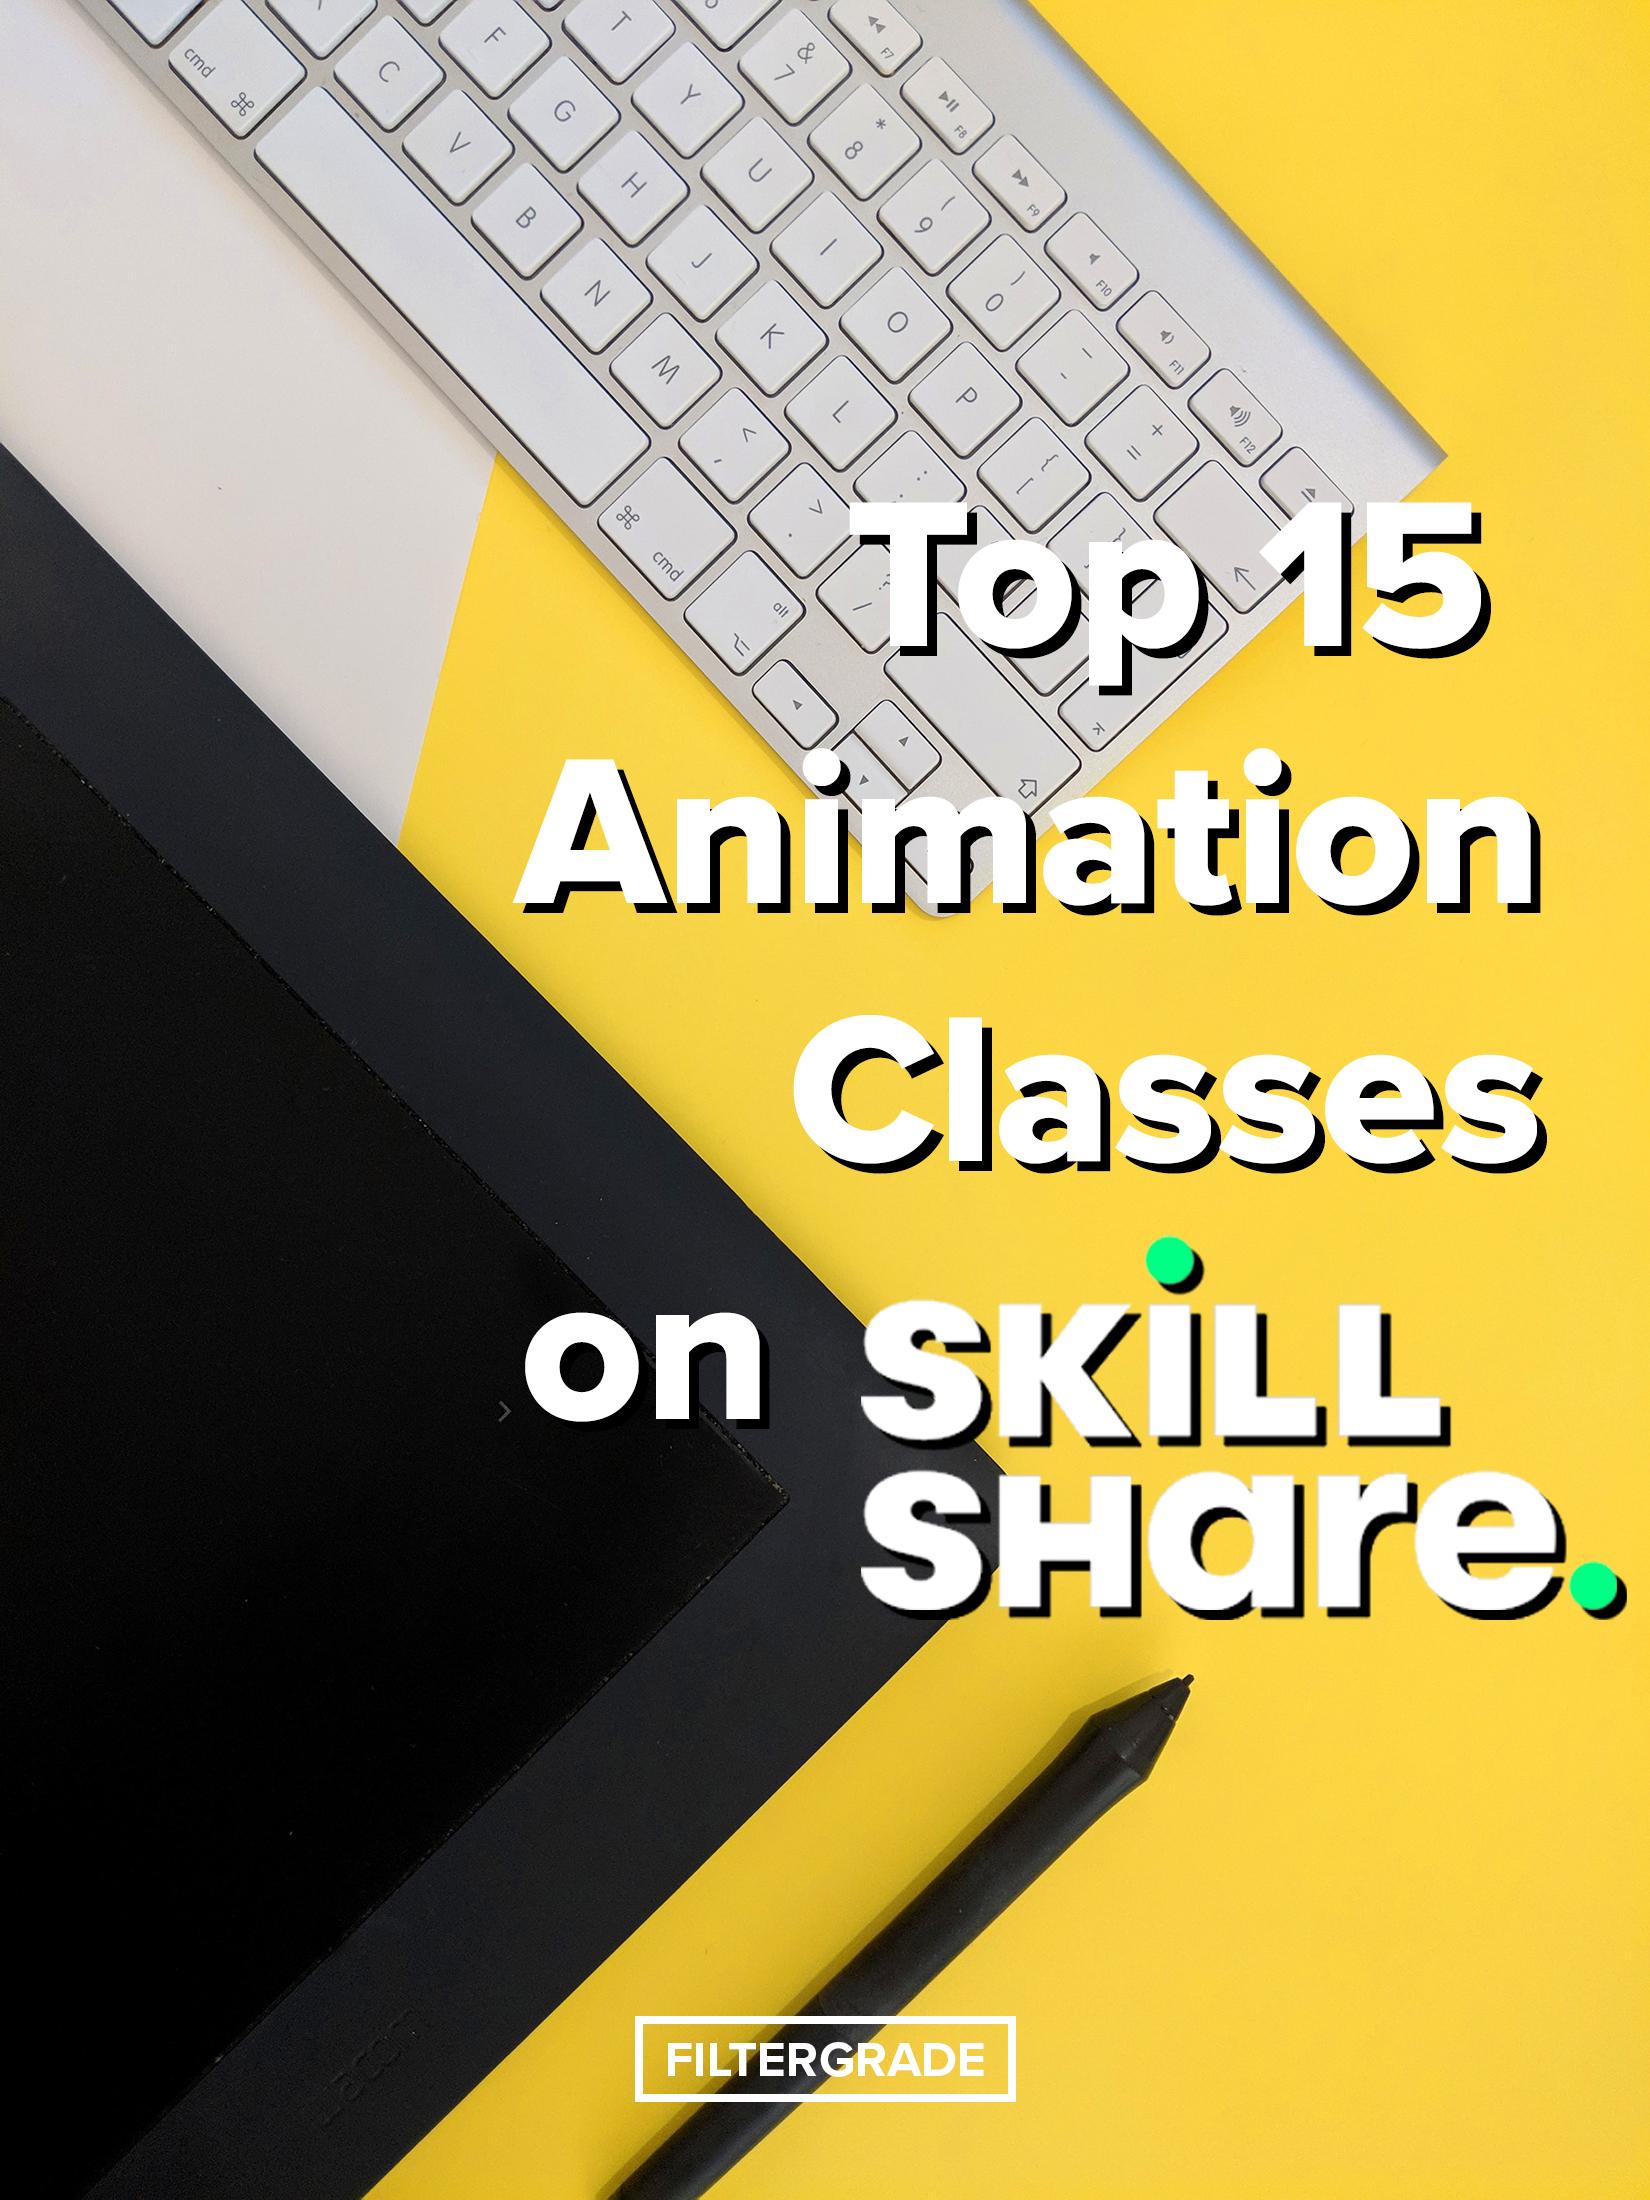 10 15 Animation Classes on Skillshare - FilterGrade